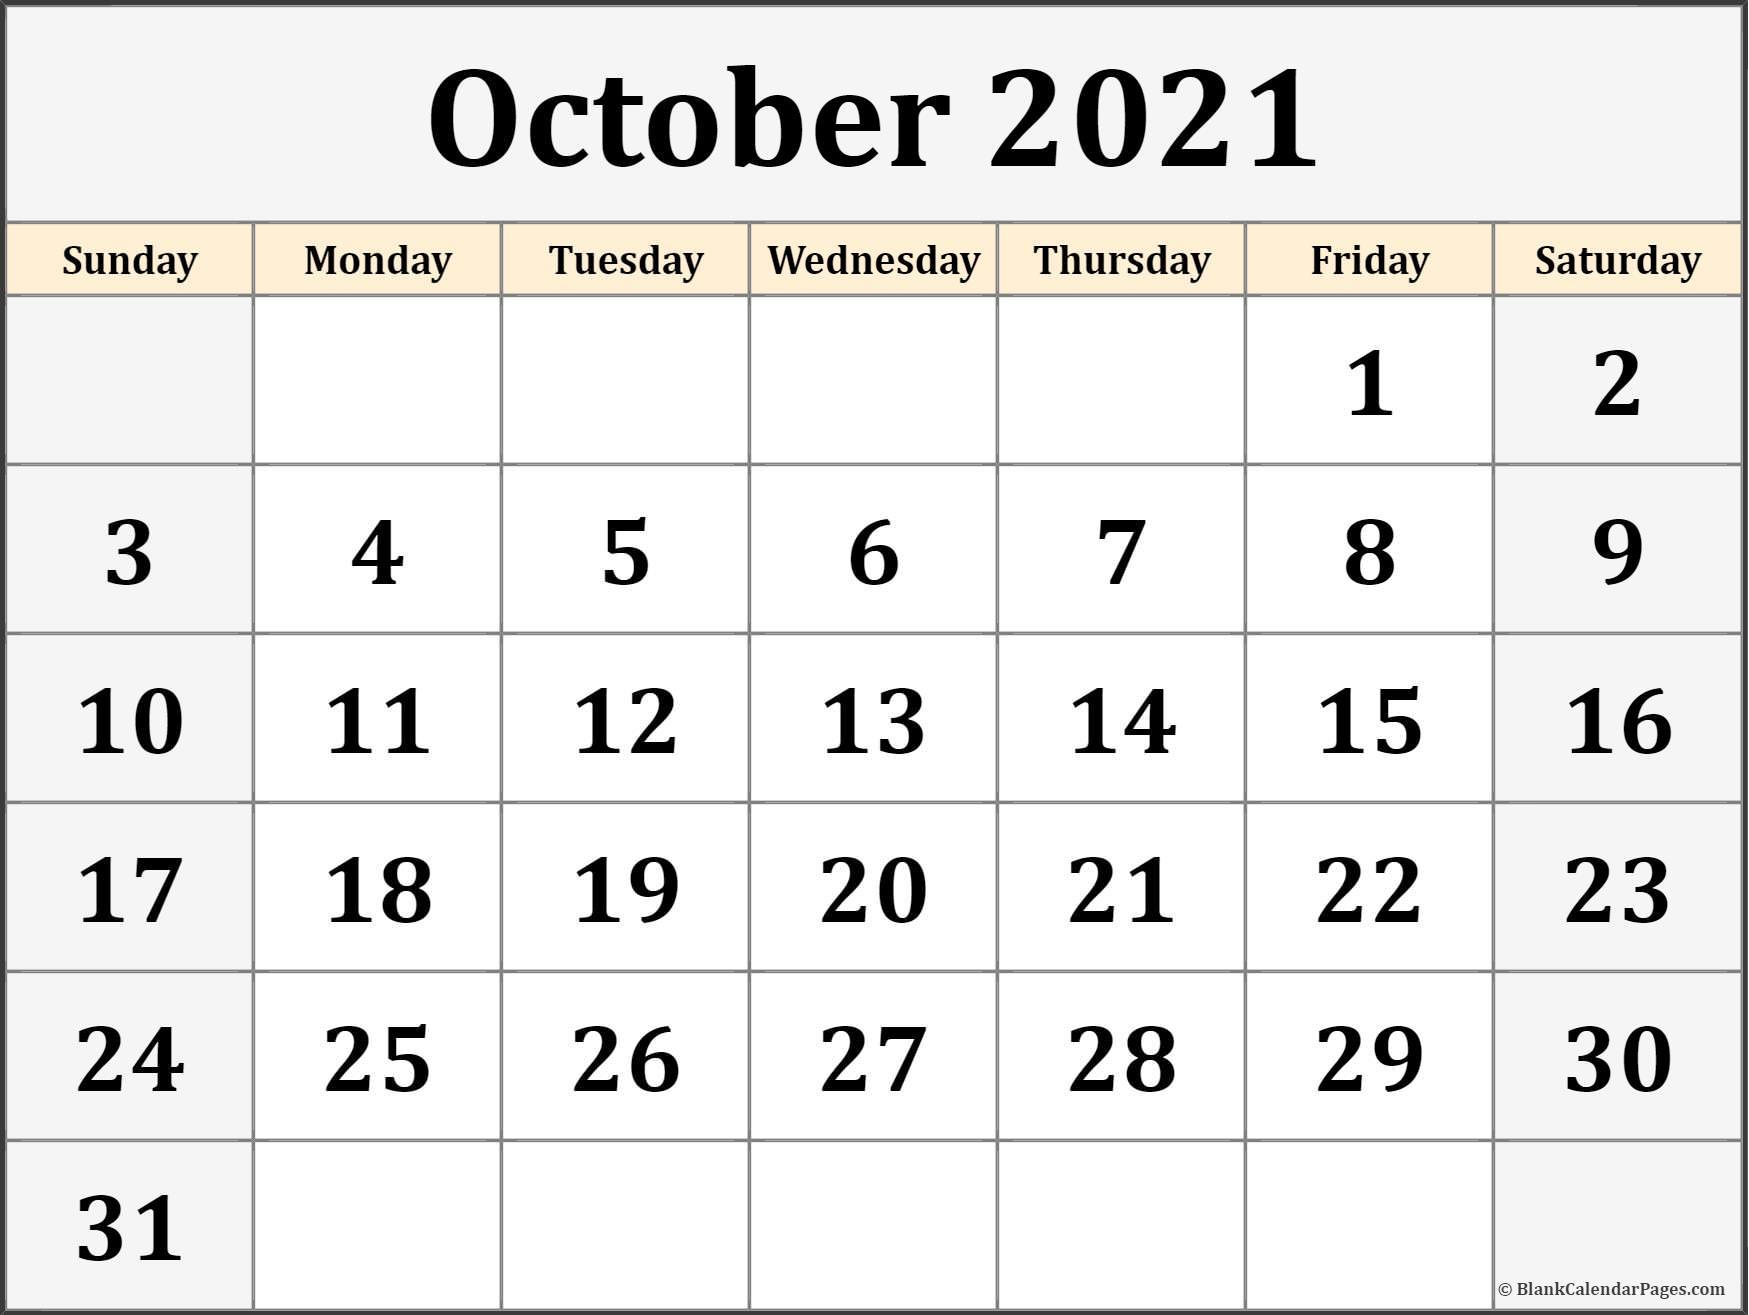 October 2021 Calendar Free Printable Monthly Calendars